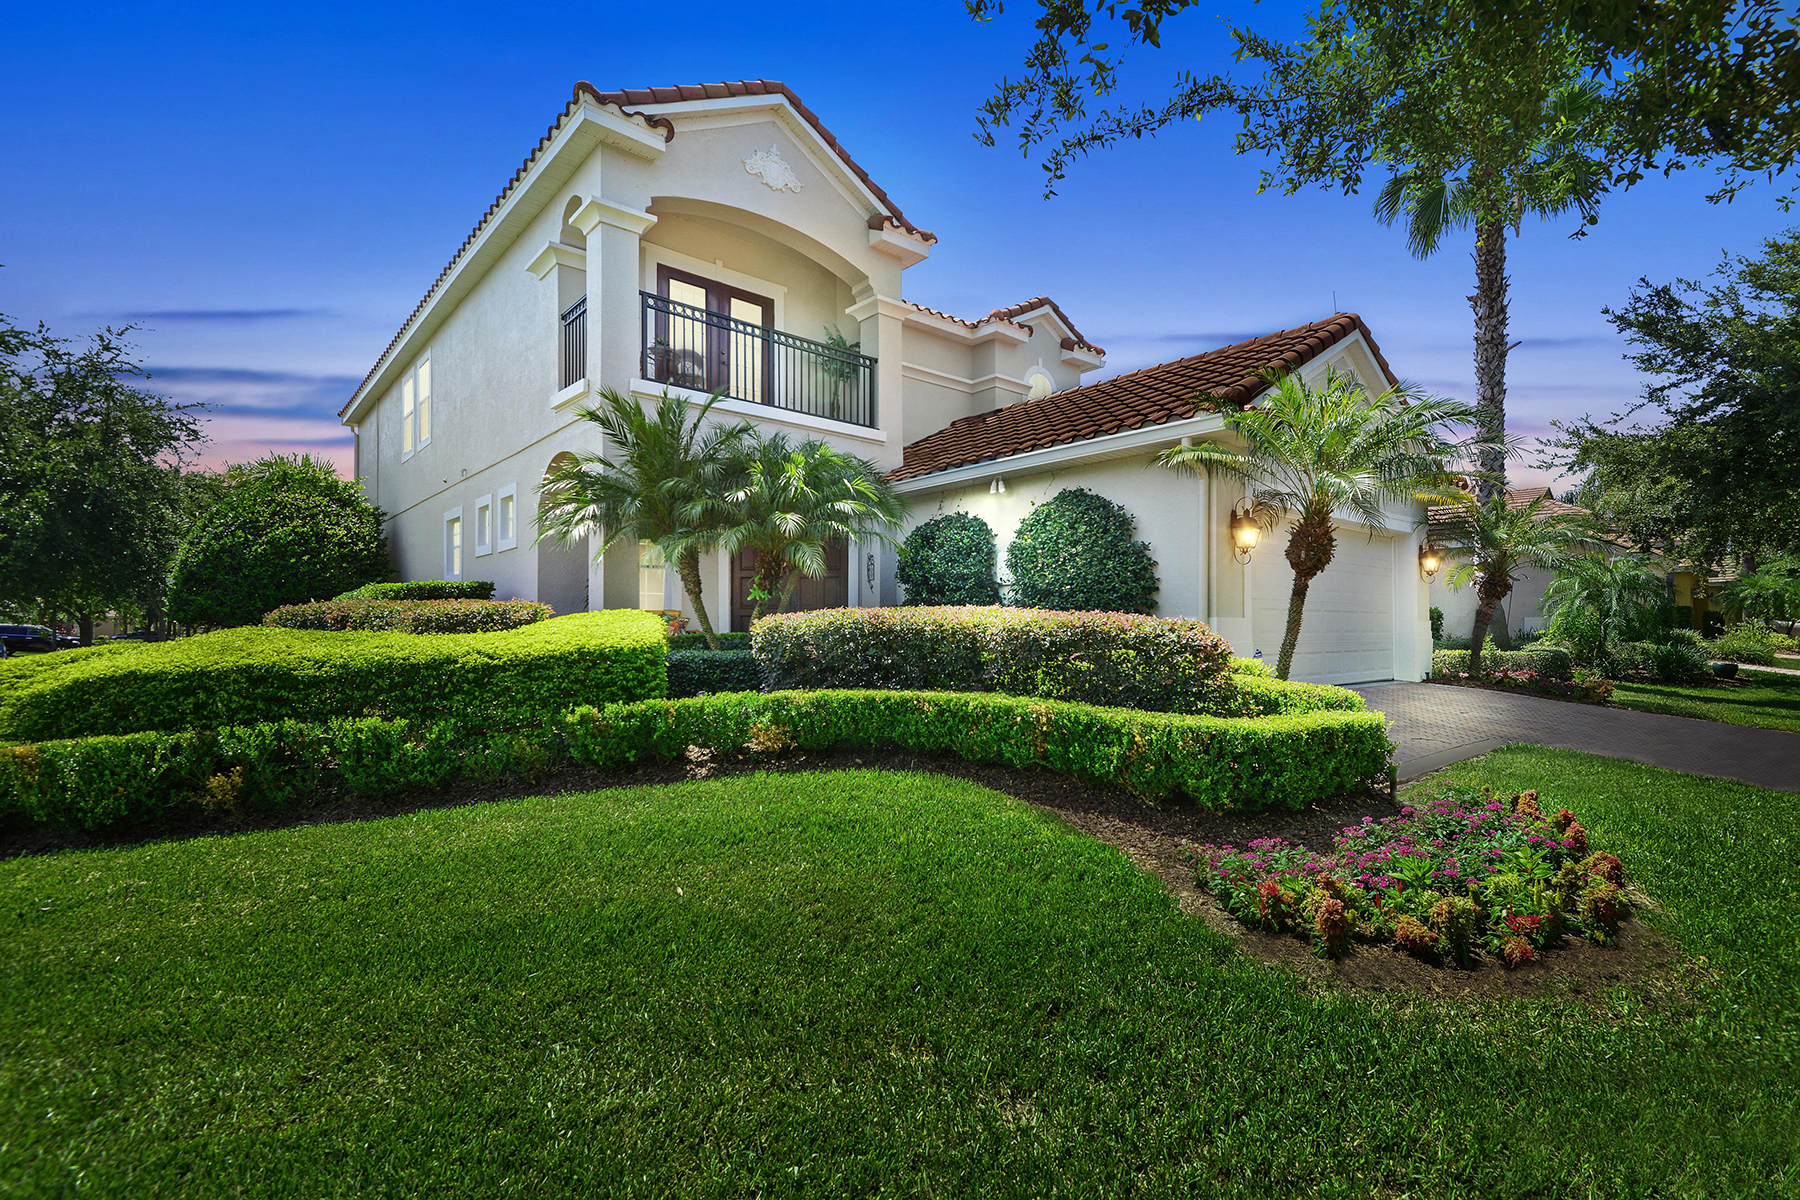 Single Family Home for Sale at Orlando, Florida 8157 Via Bella Notte Orlando, Florida, 32836 United States